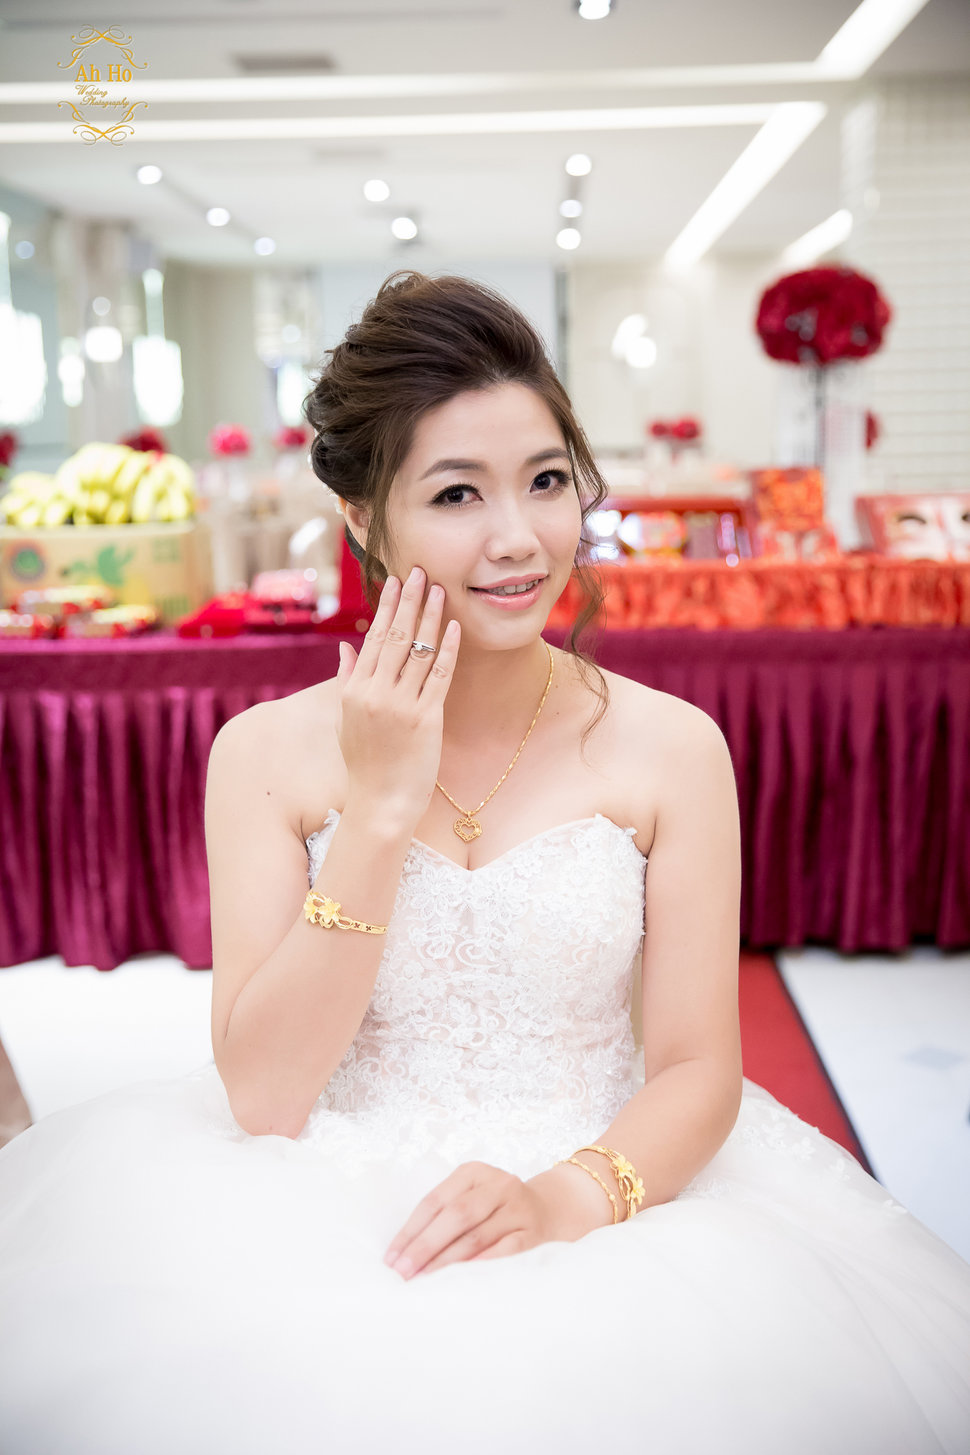 AhHo Wedding TEL-0937797161 lineID-chiupeiho (85 - 411) - AhHoWedding/阿河婚攝《結婚吧》